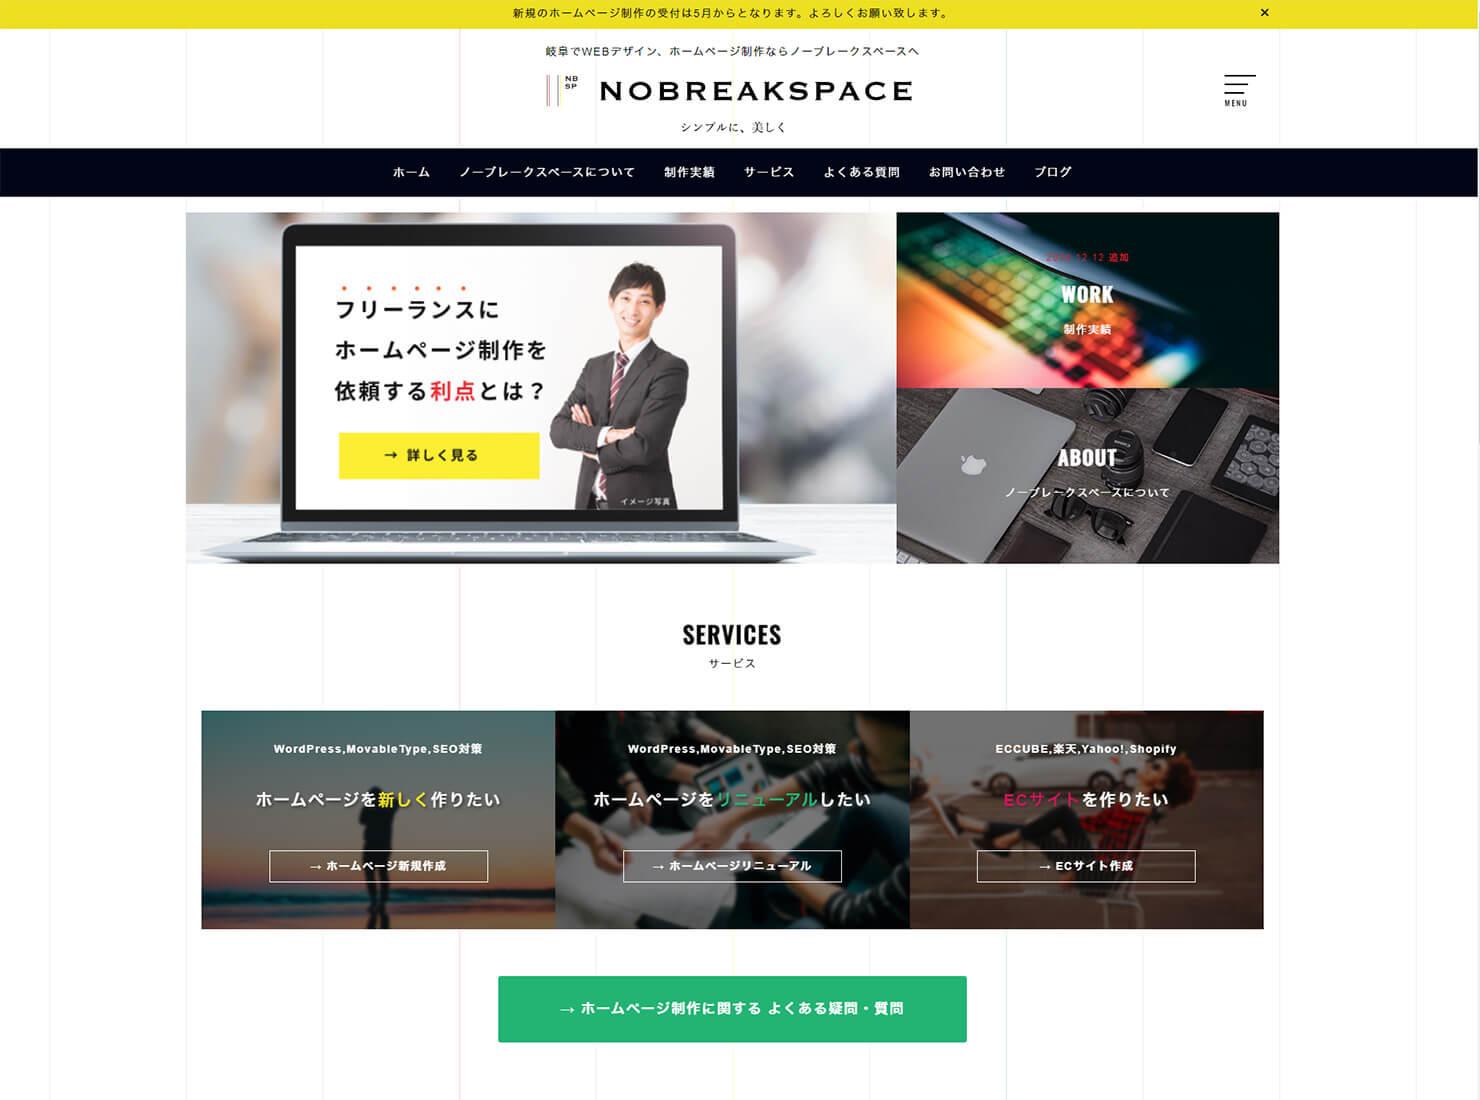 nobreakspace